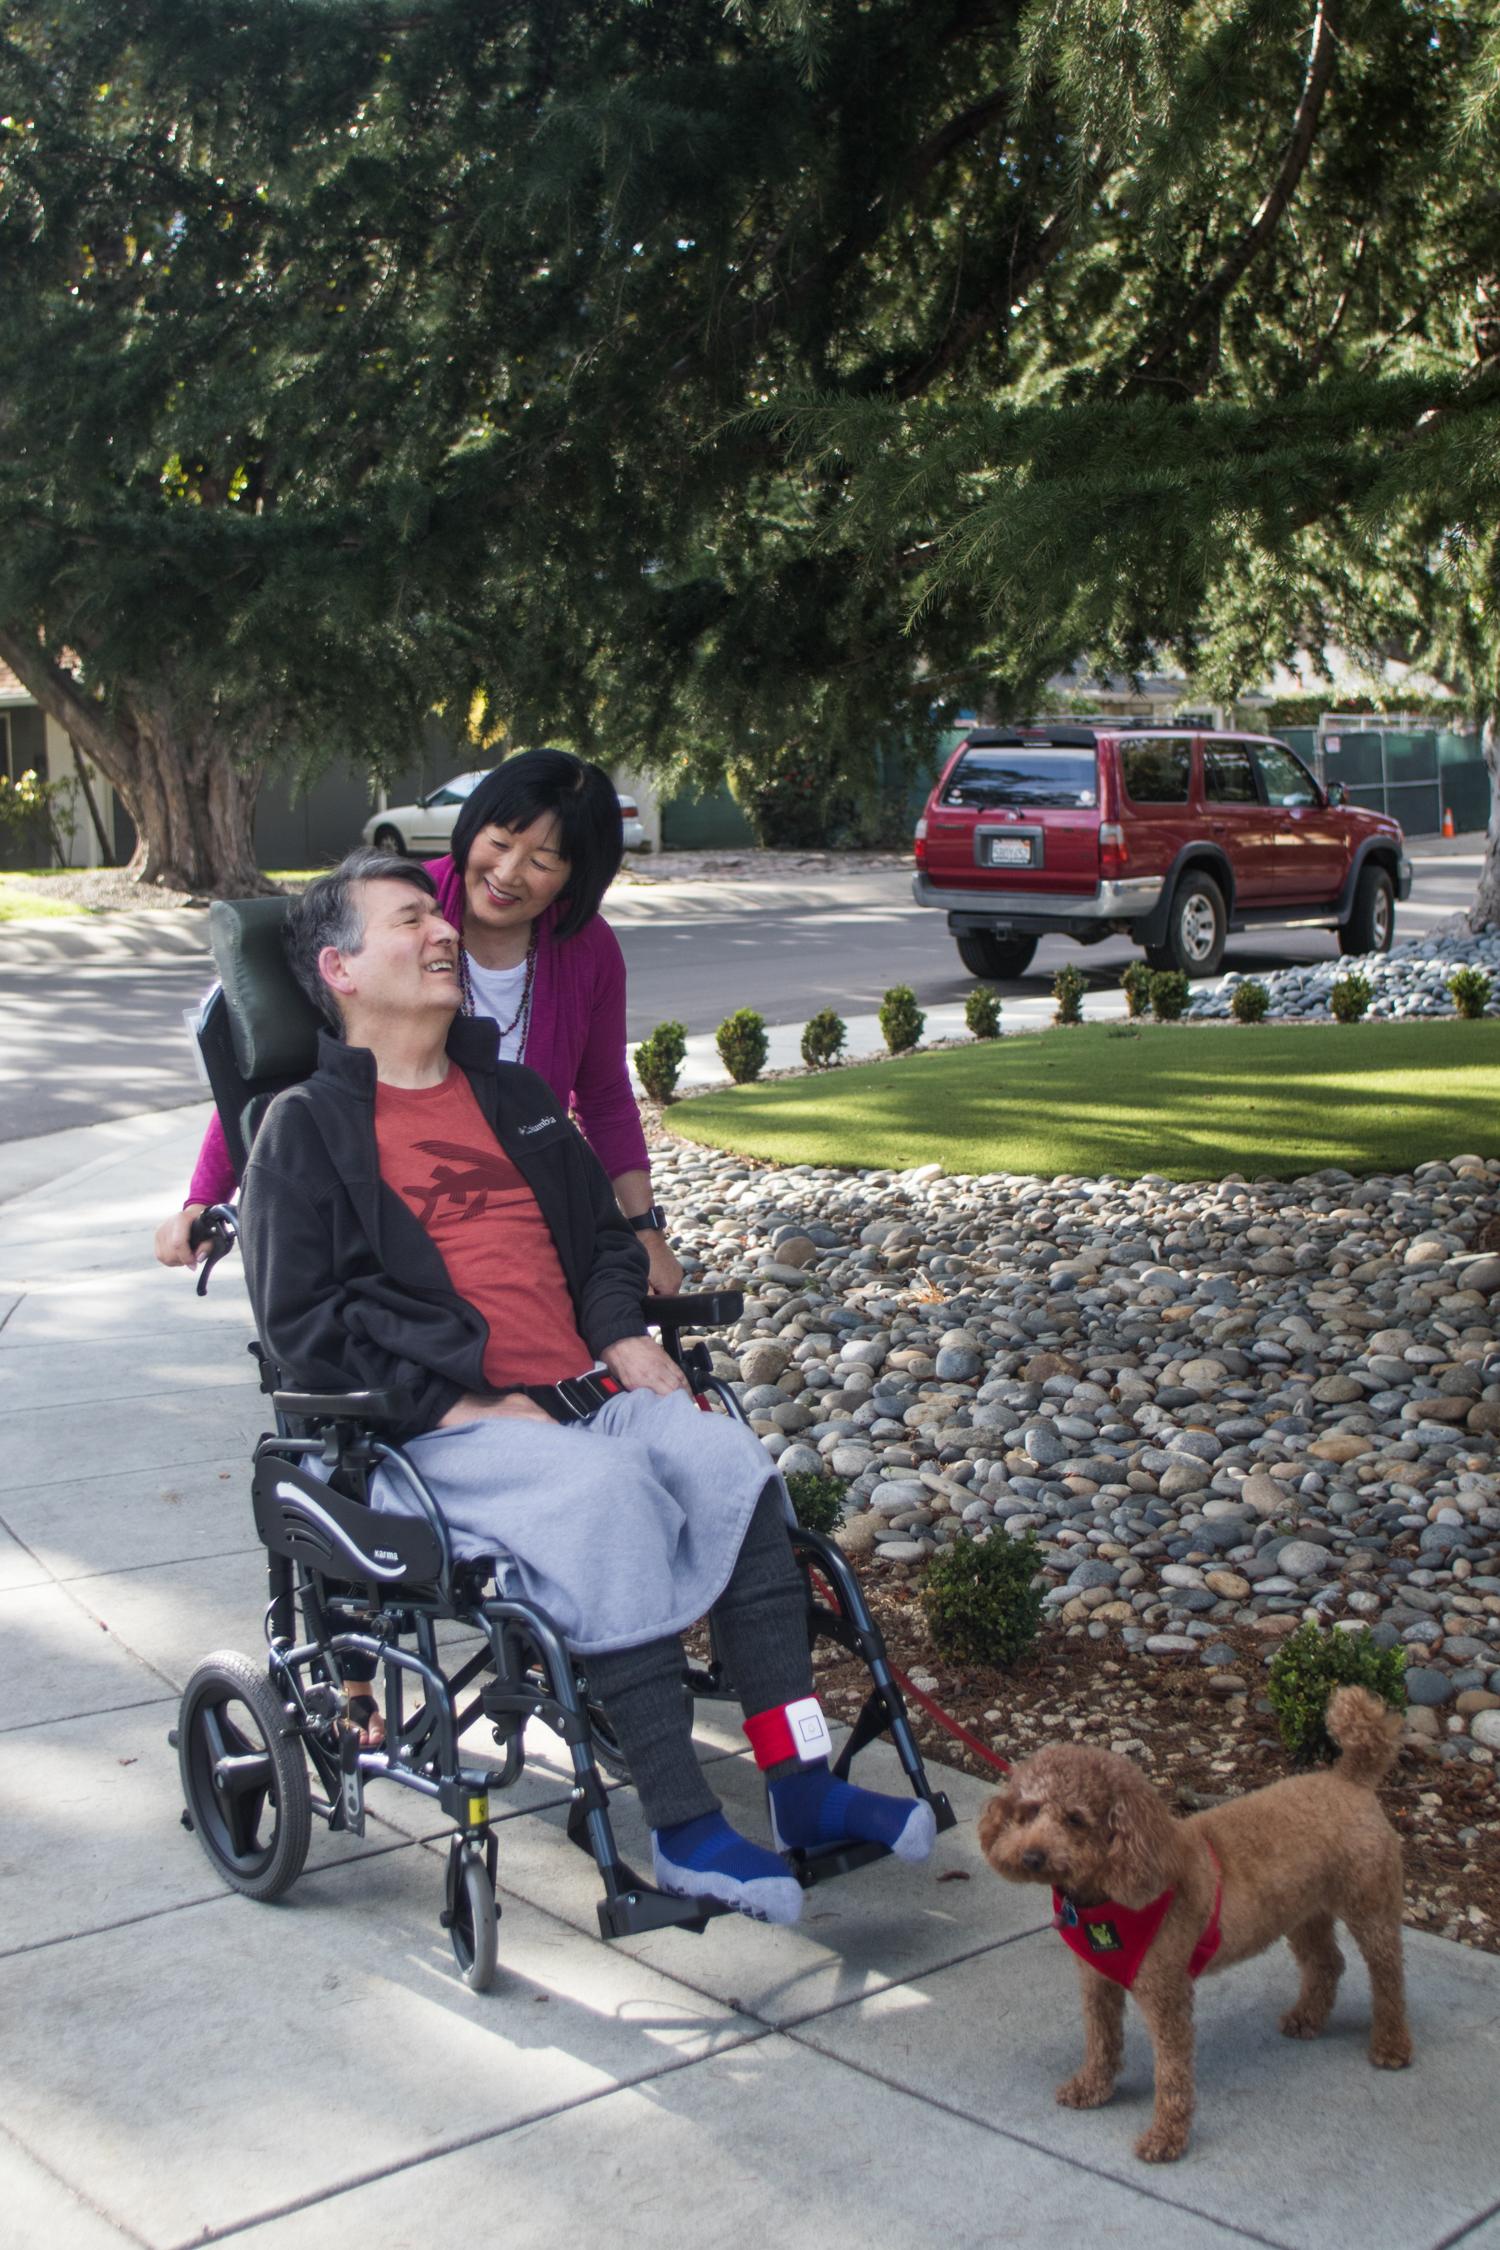 Karen Kang and Jon Ferraiolo go for a stroll around their Duveneck/St. Francis neighborhood with their dog, Pepe, on March 8, 2018.